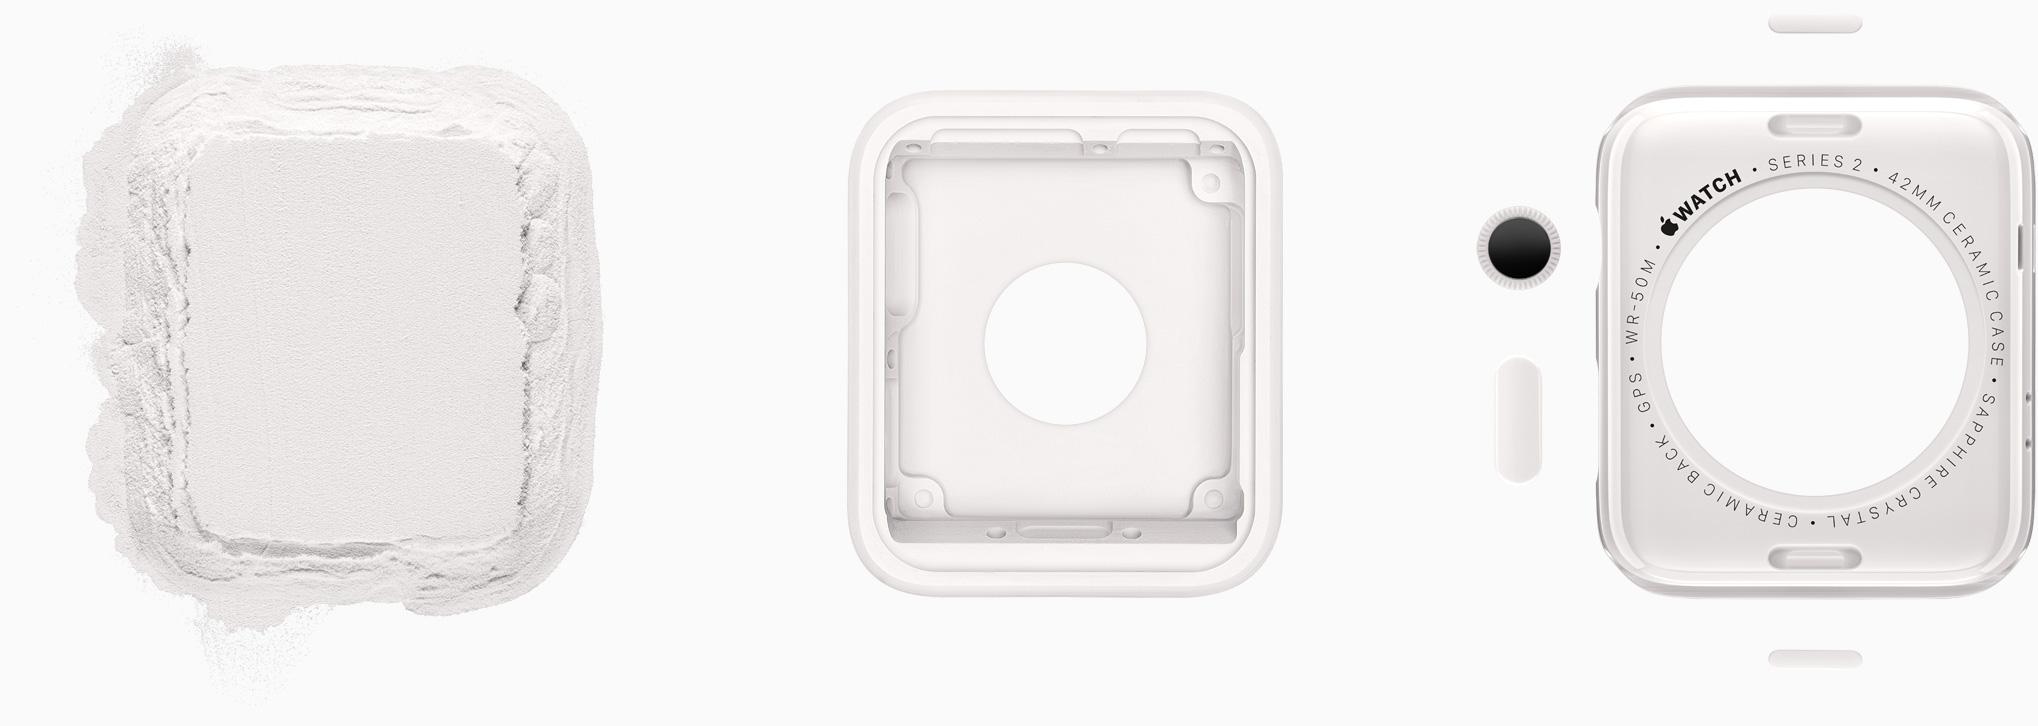 Apple_ceramic_Watch.jpeg